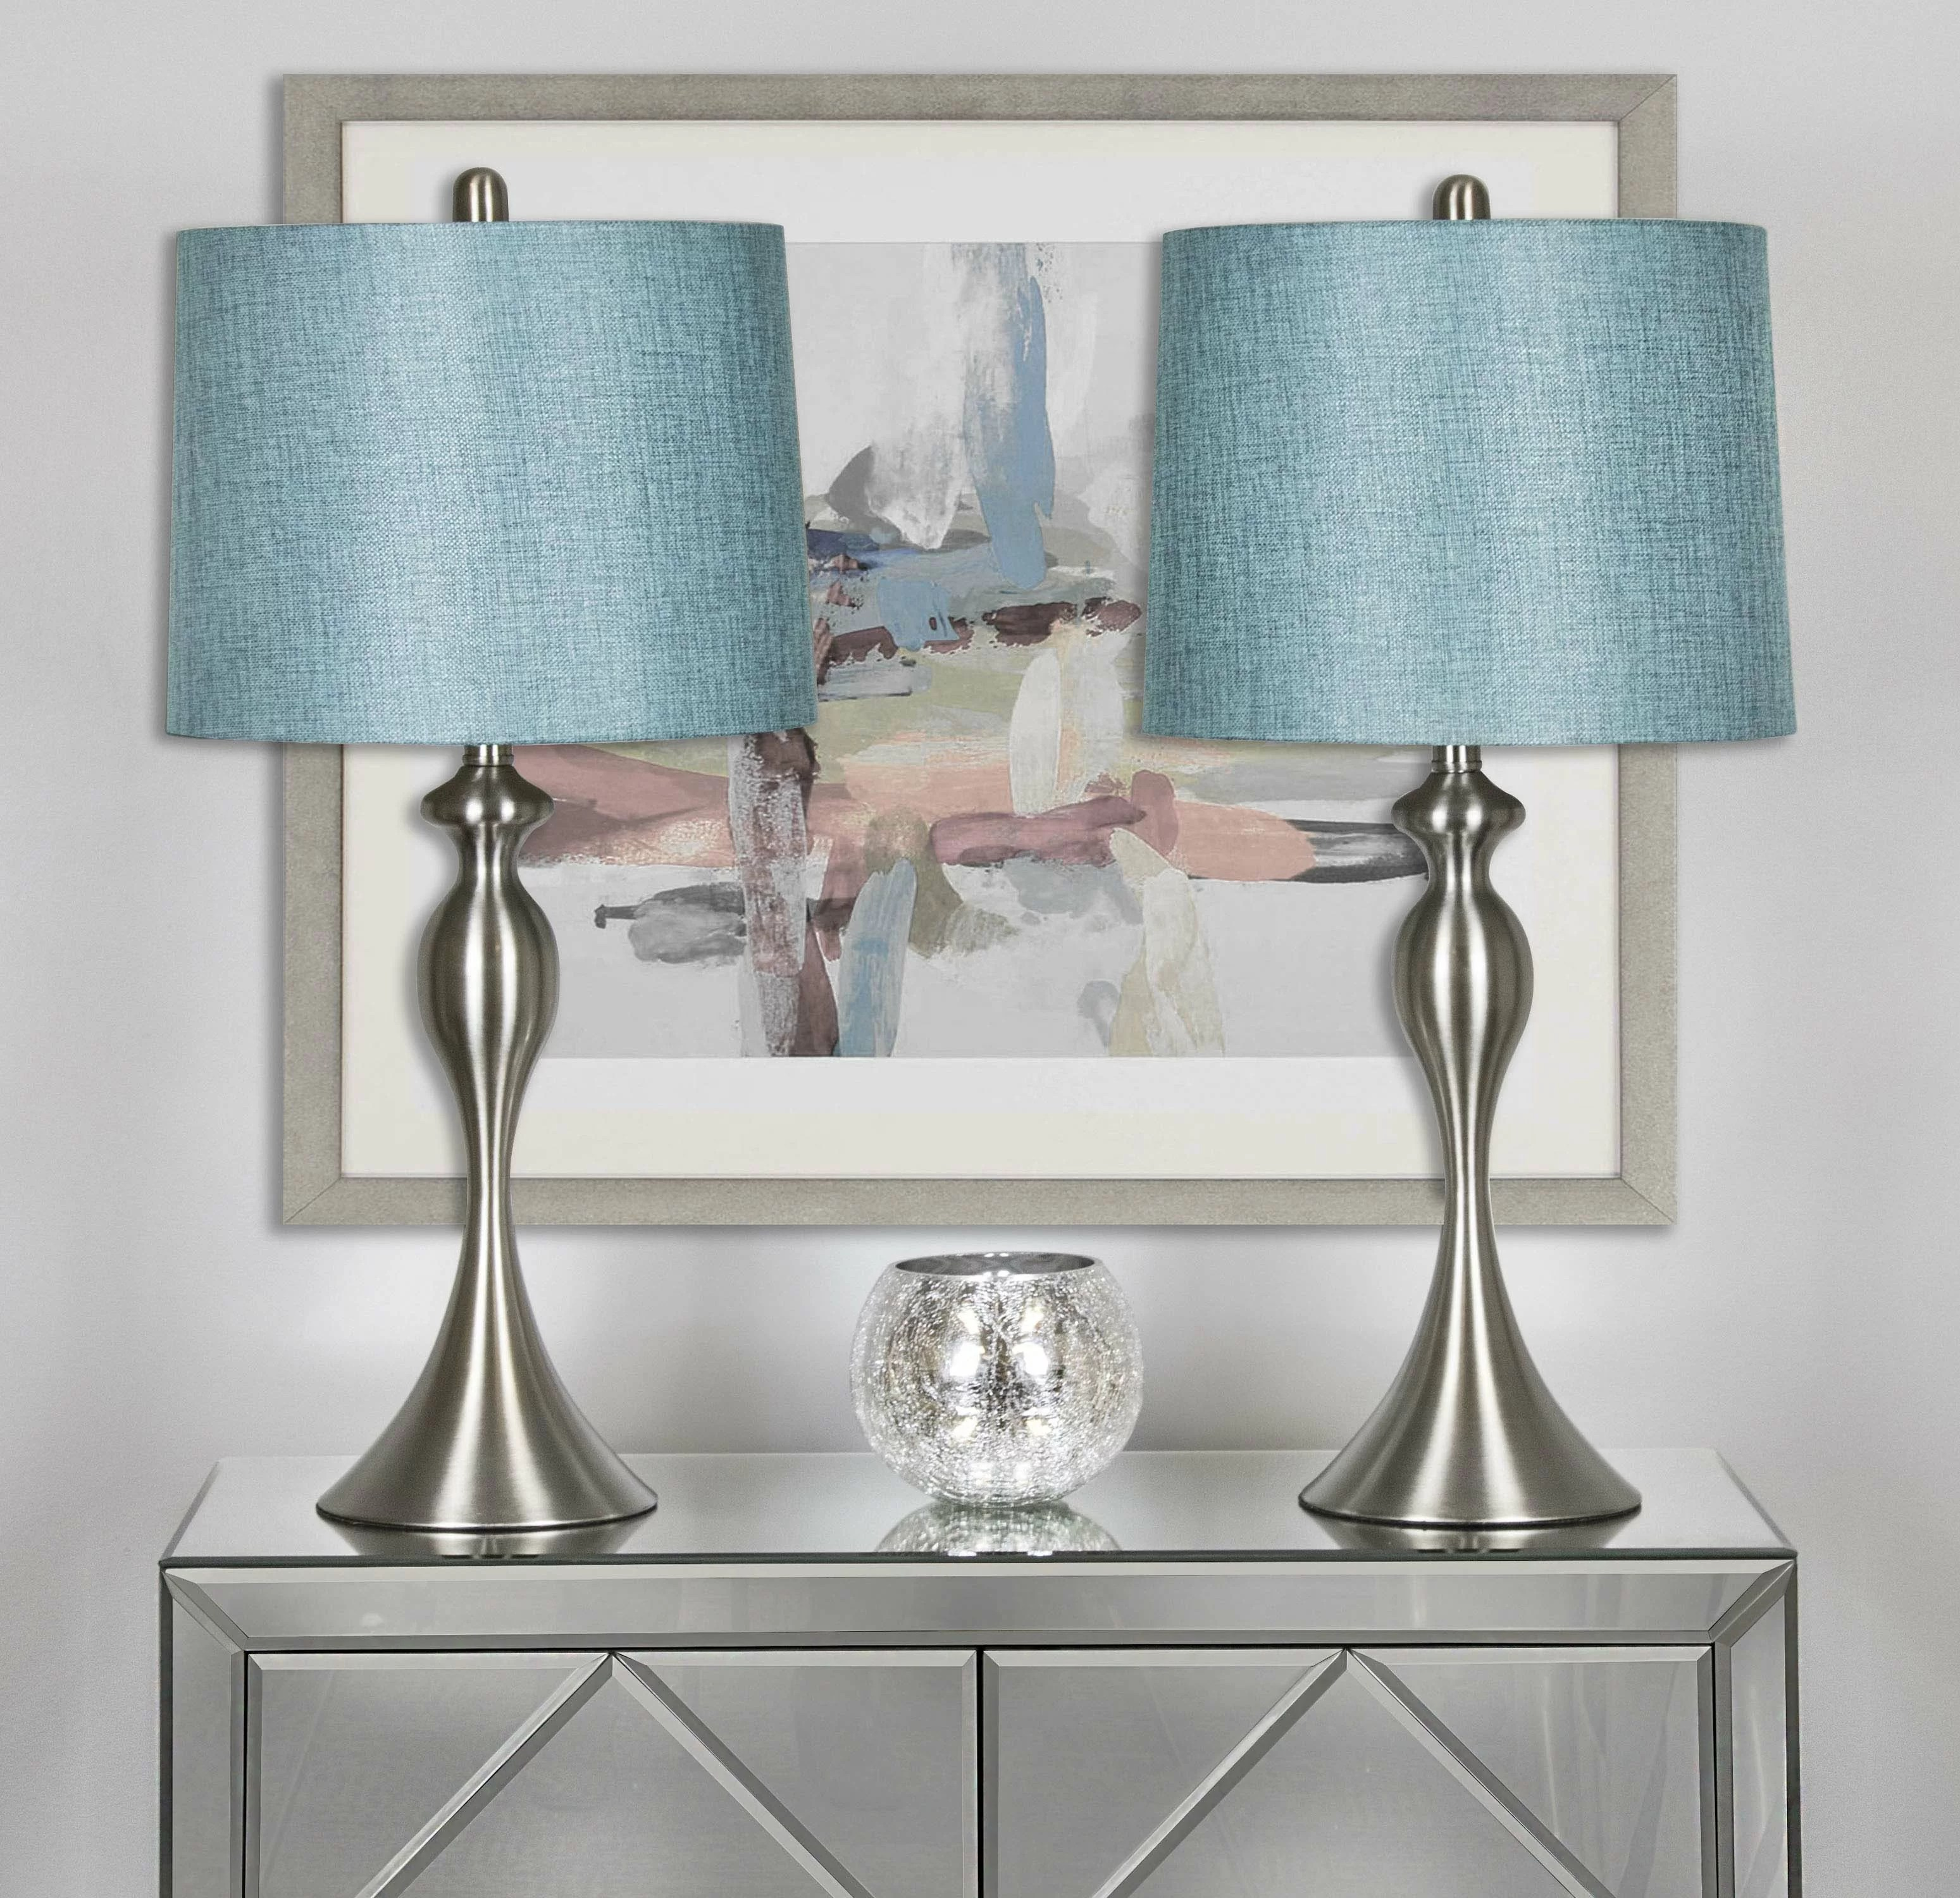 pennsylvania 27 table lamp set